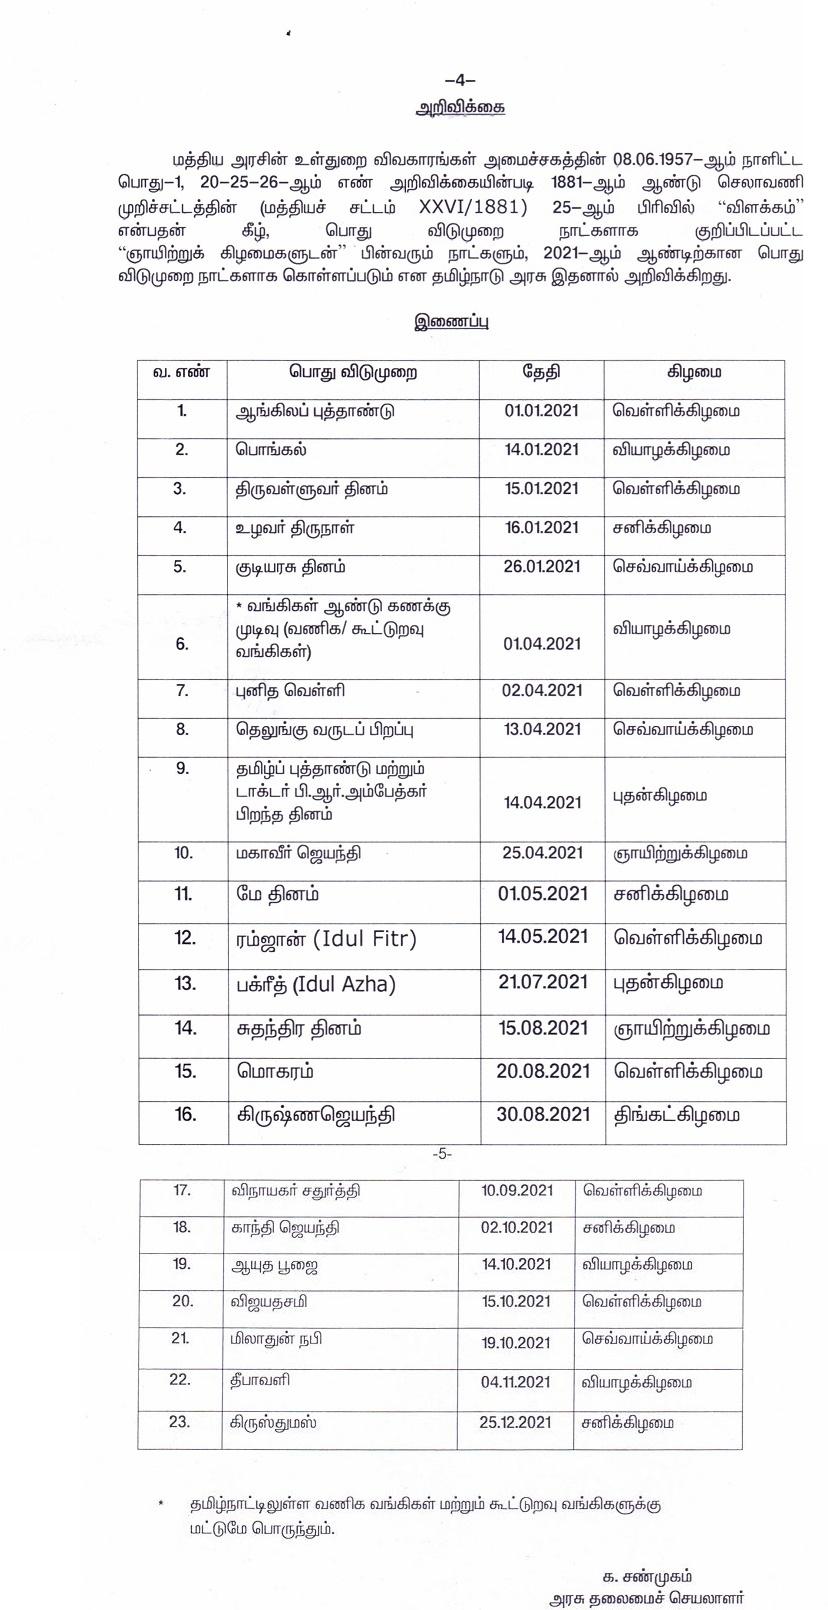 Tamil Nadu Government Holidays 2021 pdf - Bank Holidays in ...